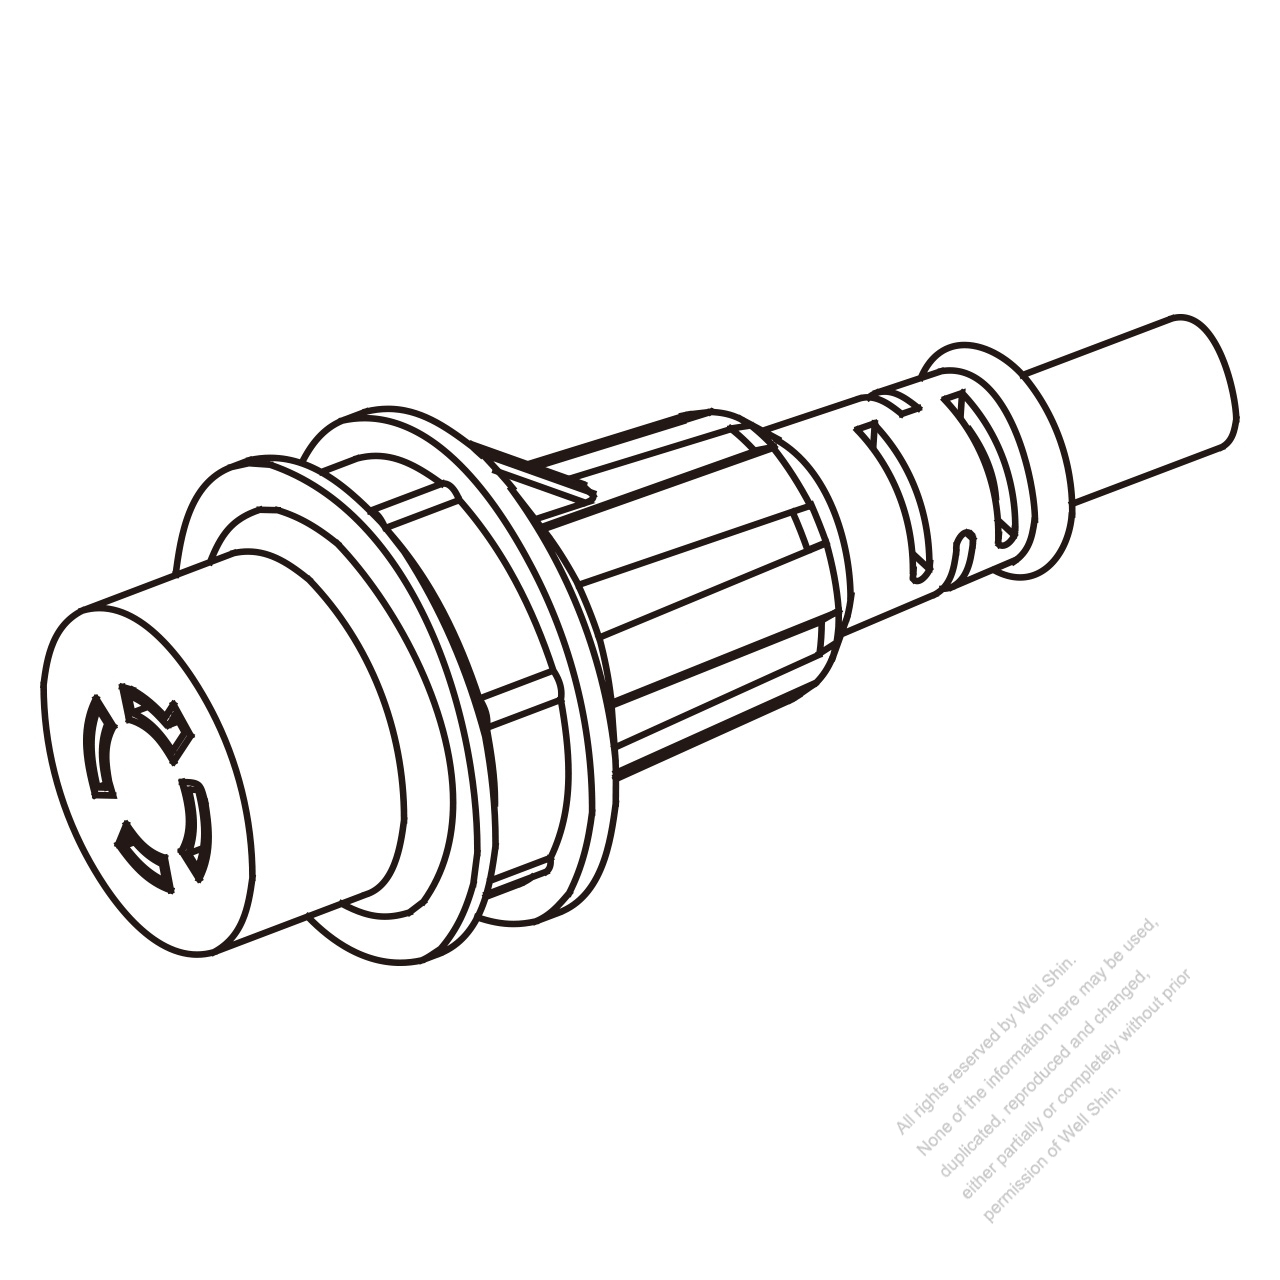 B2d35d56ac4a11e515b0gY nema l14 30 wiring diagram 4 on nema l14 30 wiring diagram